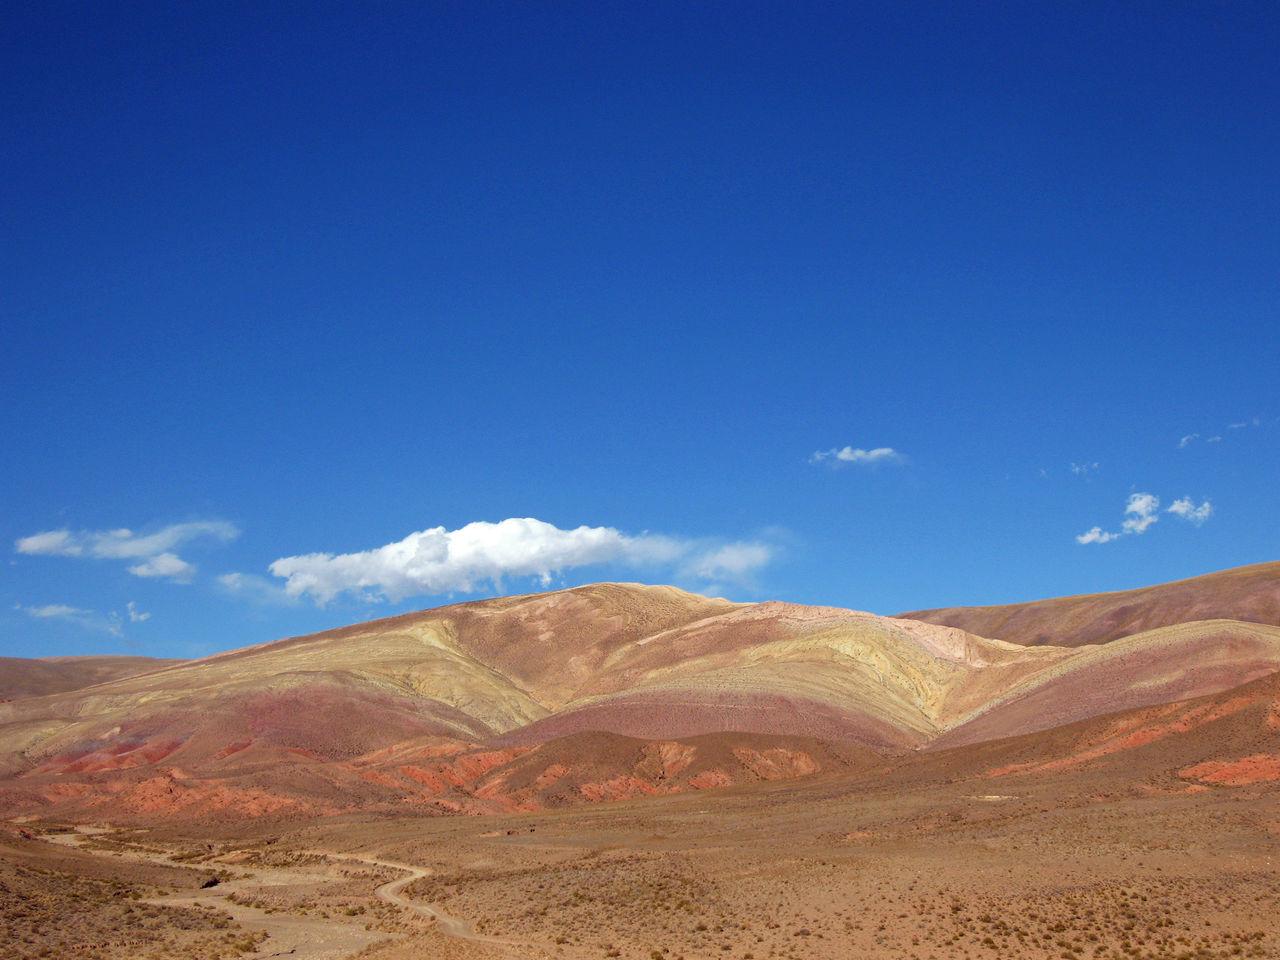 Andes Andes Mountains Andesmountains Argentina Desert Desert Beauty Desert Landscape Desert Mountains Desert Mountains Time Beautiful